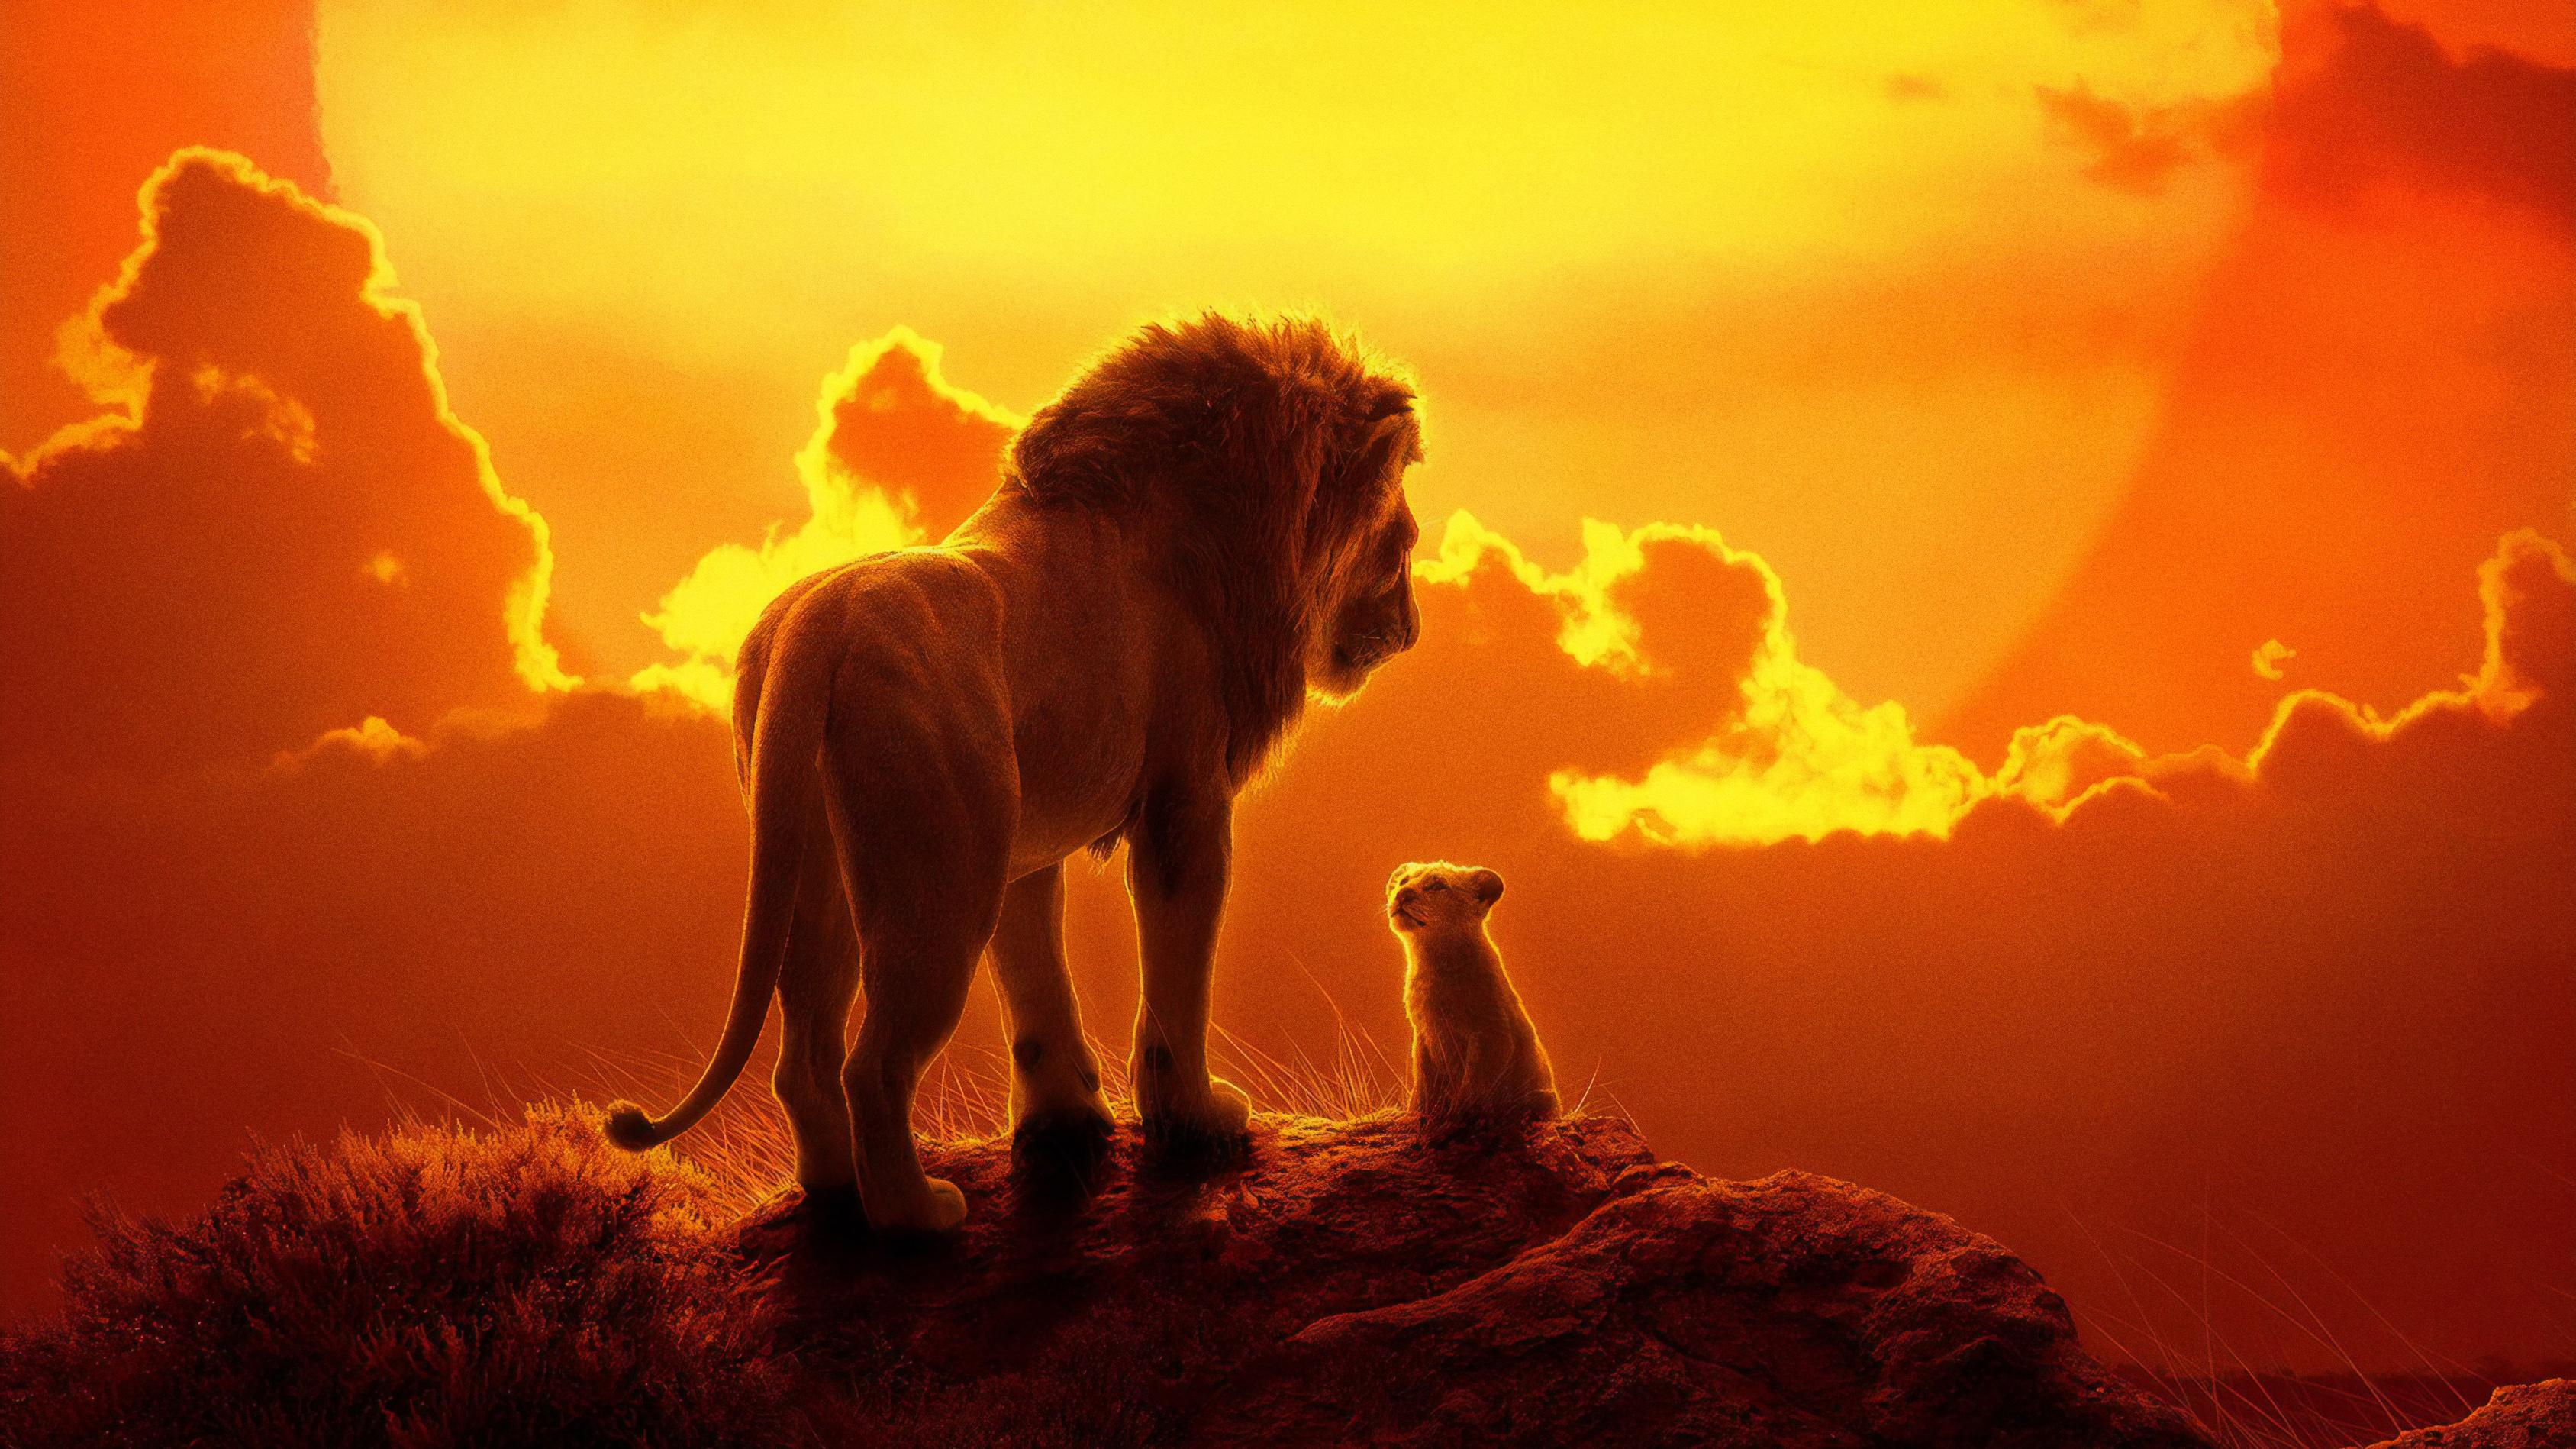 29 The Lion King 2019 Wallpapers On Wallpapersafari